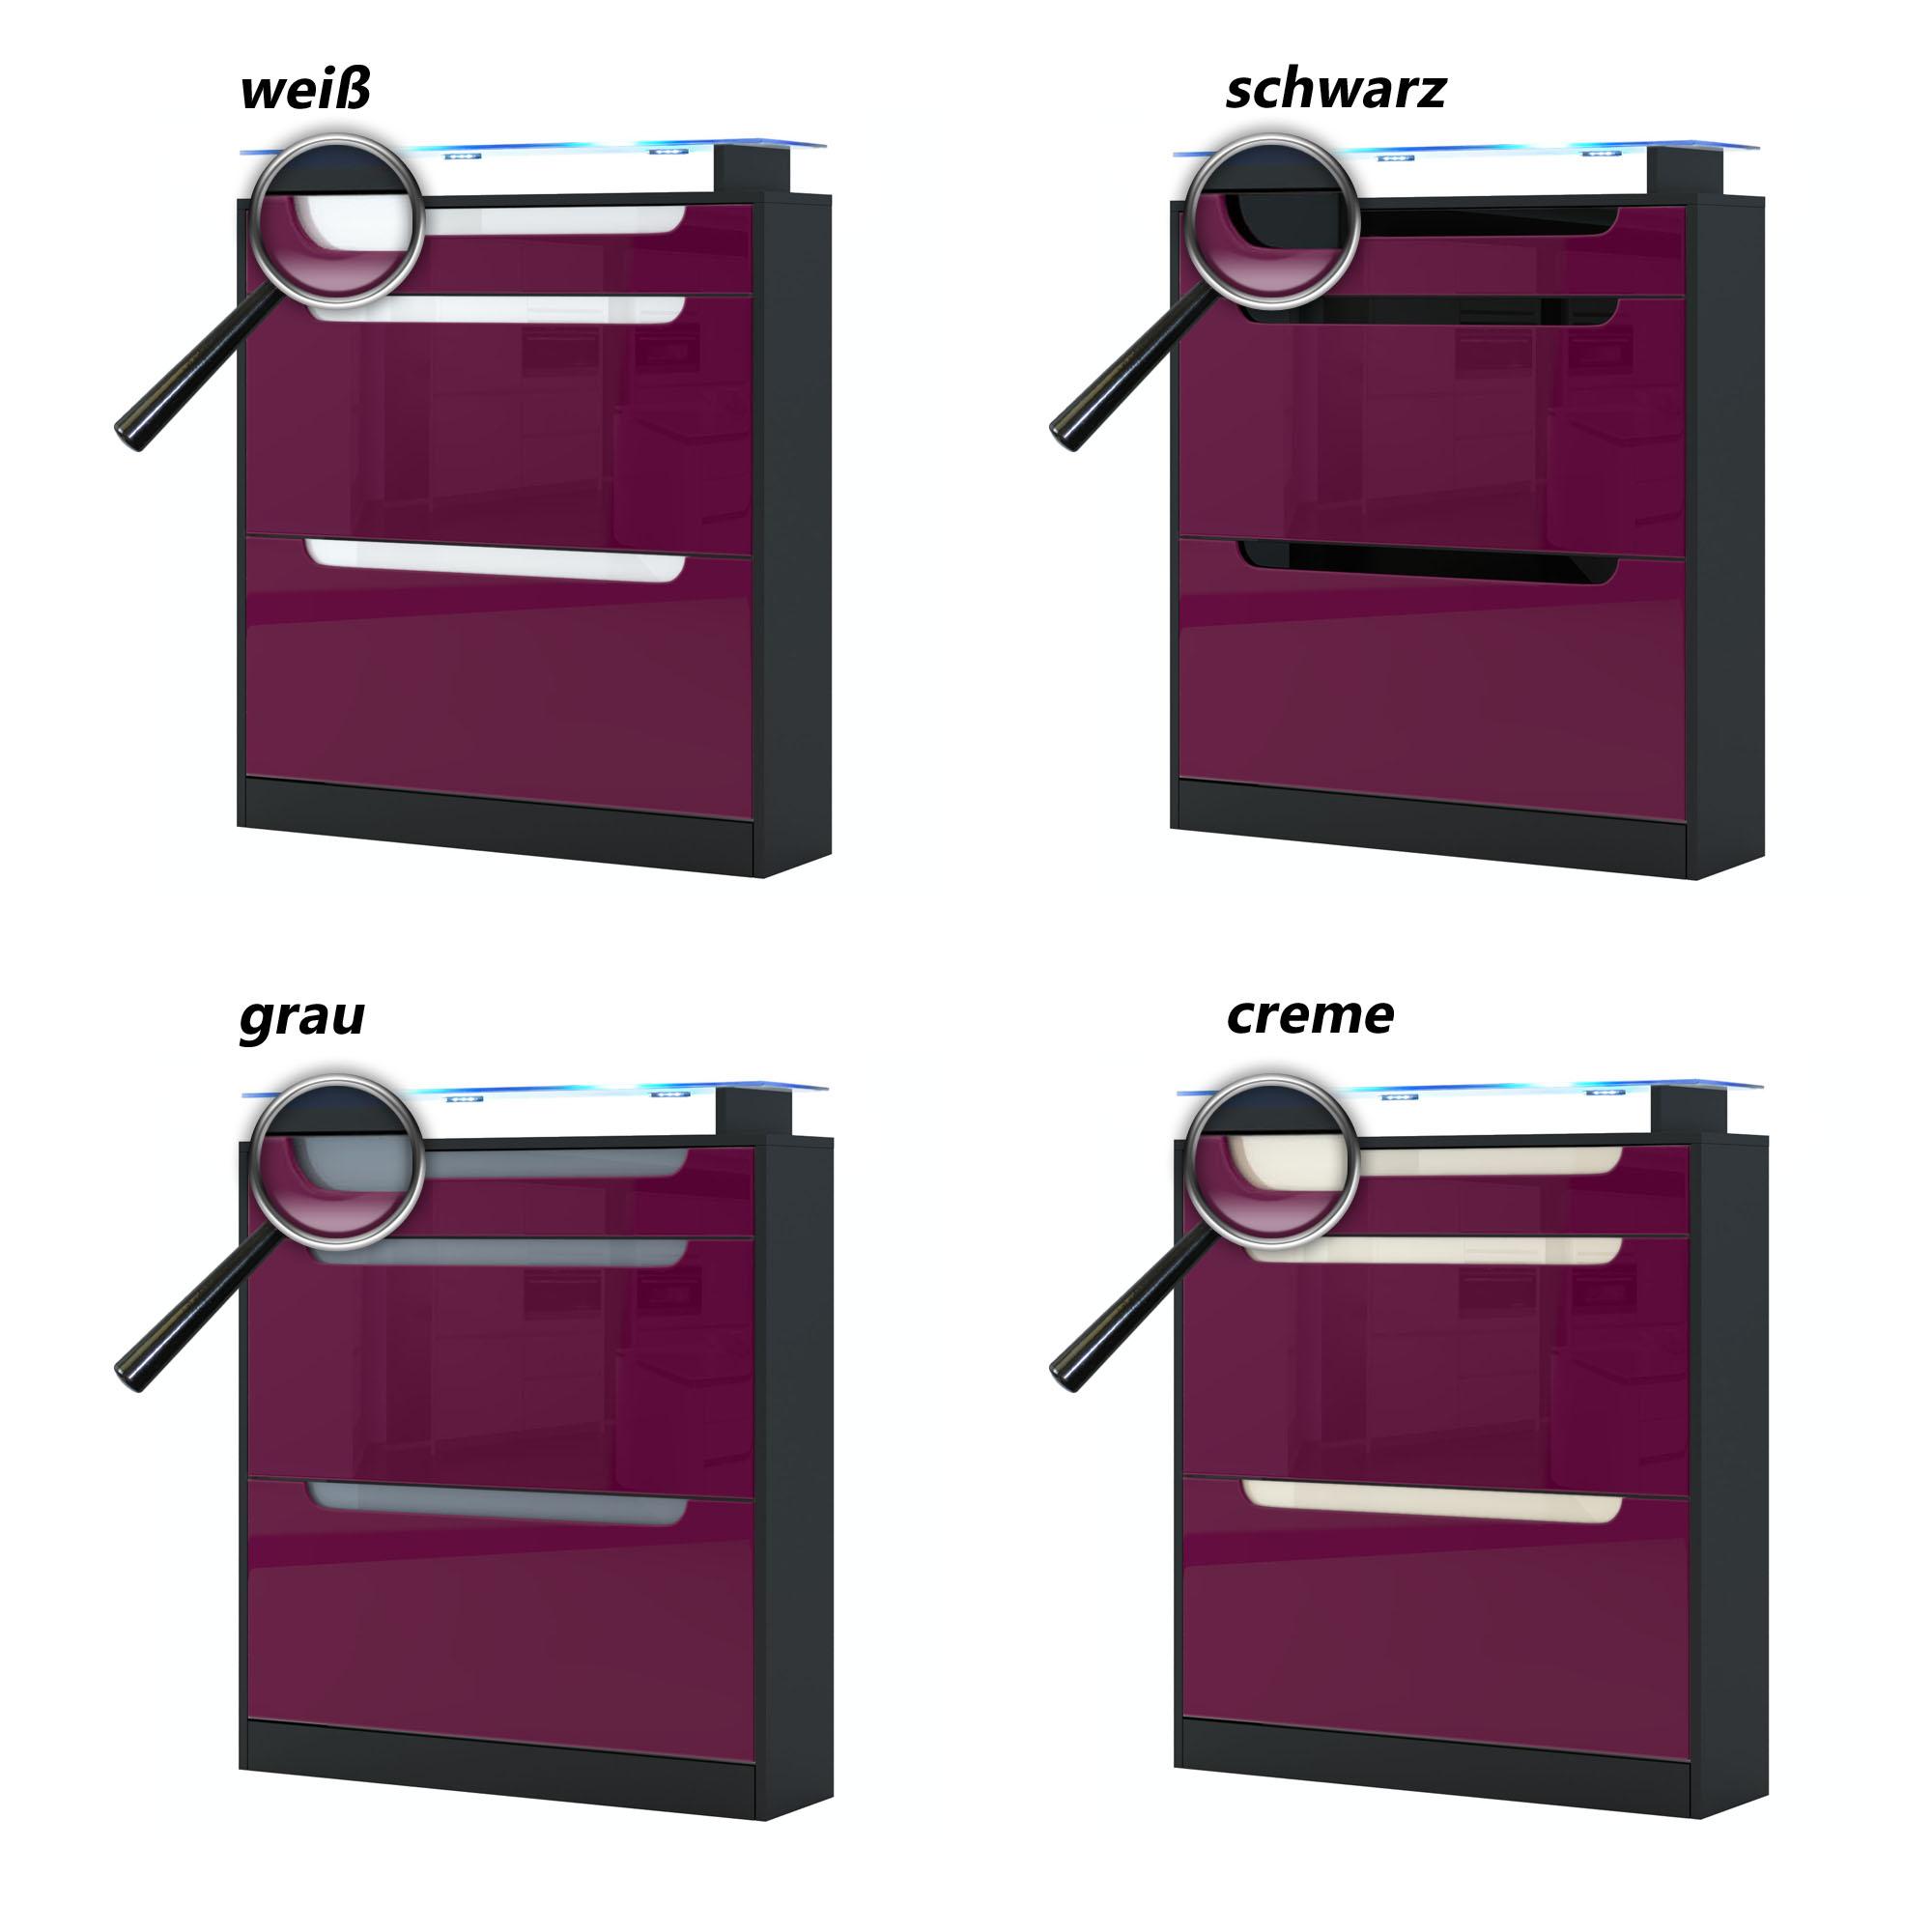 schuhschrank schuhkipper schuhregal regal flur schrank fiesta schwarz hochglanz ebay. Black Bedroom Furniture Sets. Home Design Ideas